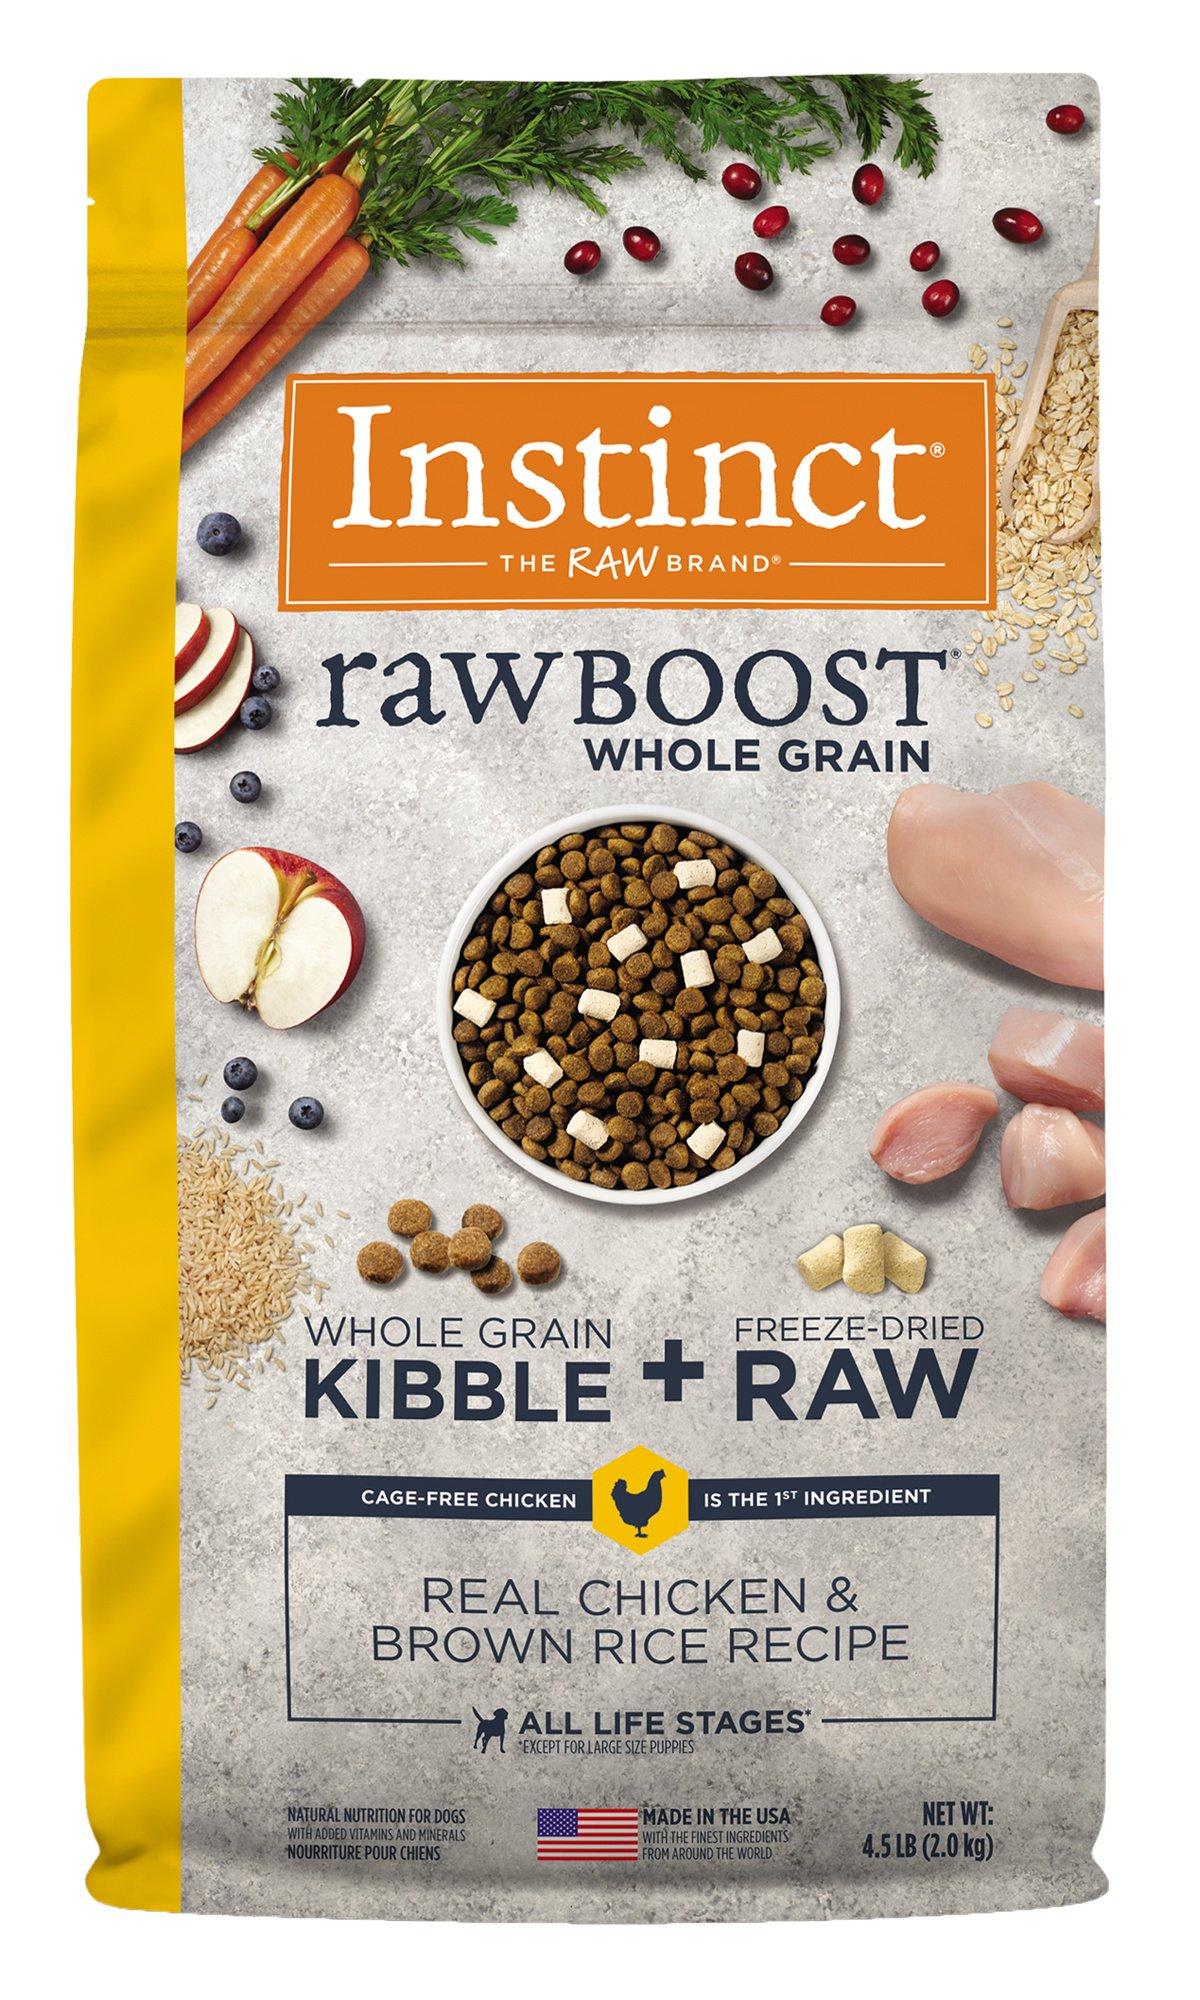 Instinct Instinct Raw Boost Whole Grain Real Chicken & Brown Rice Recipe Dry Dog Food